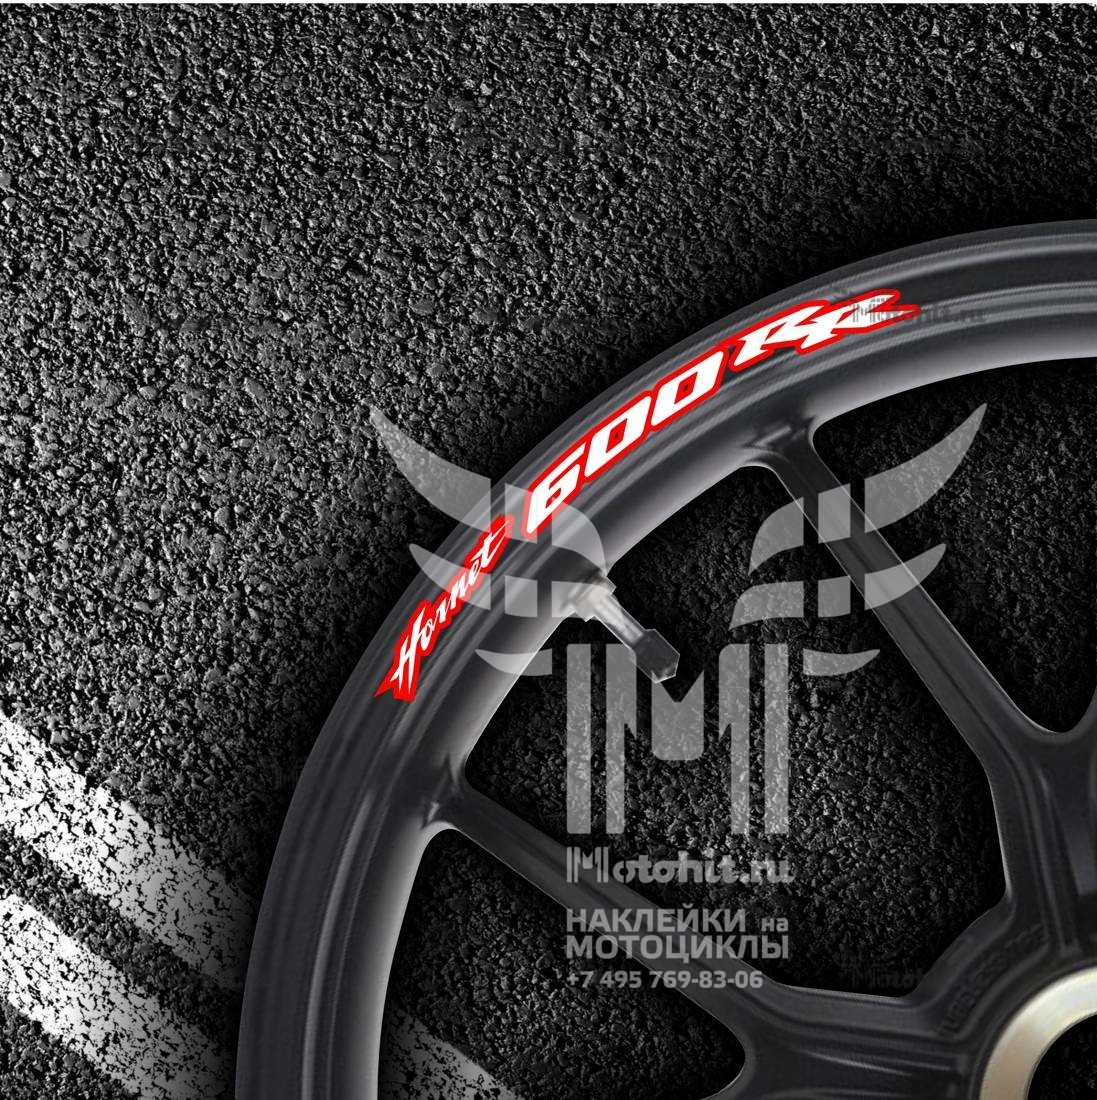 Комплект наклеек на обод колеса мотоцикла HONDA HORNET-600-RR